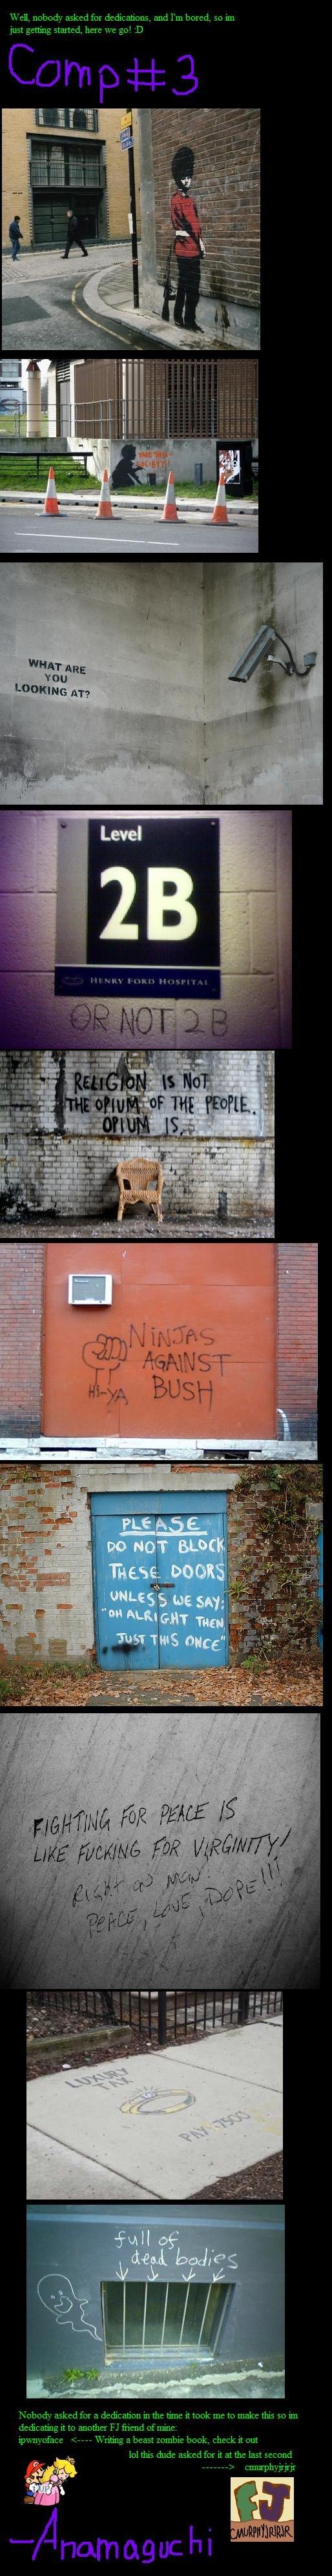 Funny Graffiti Compilation pt3. part8:<br />. I like this one to. Graffiti anamaguchi